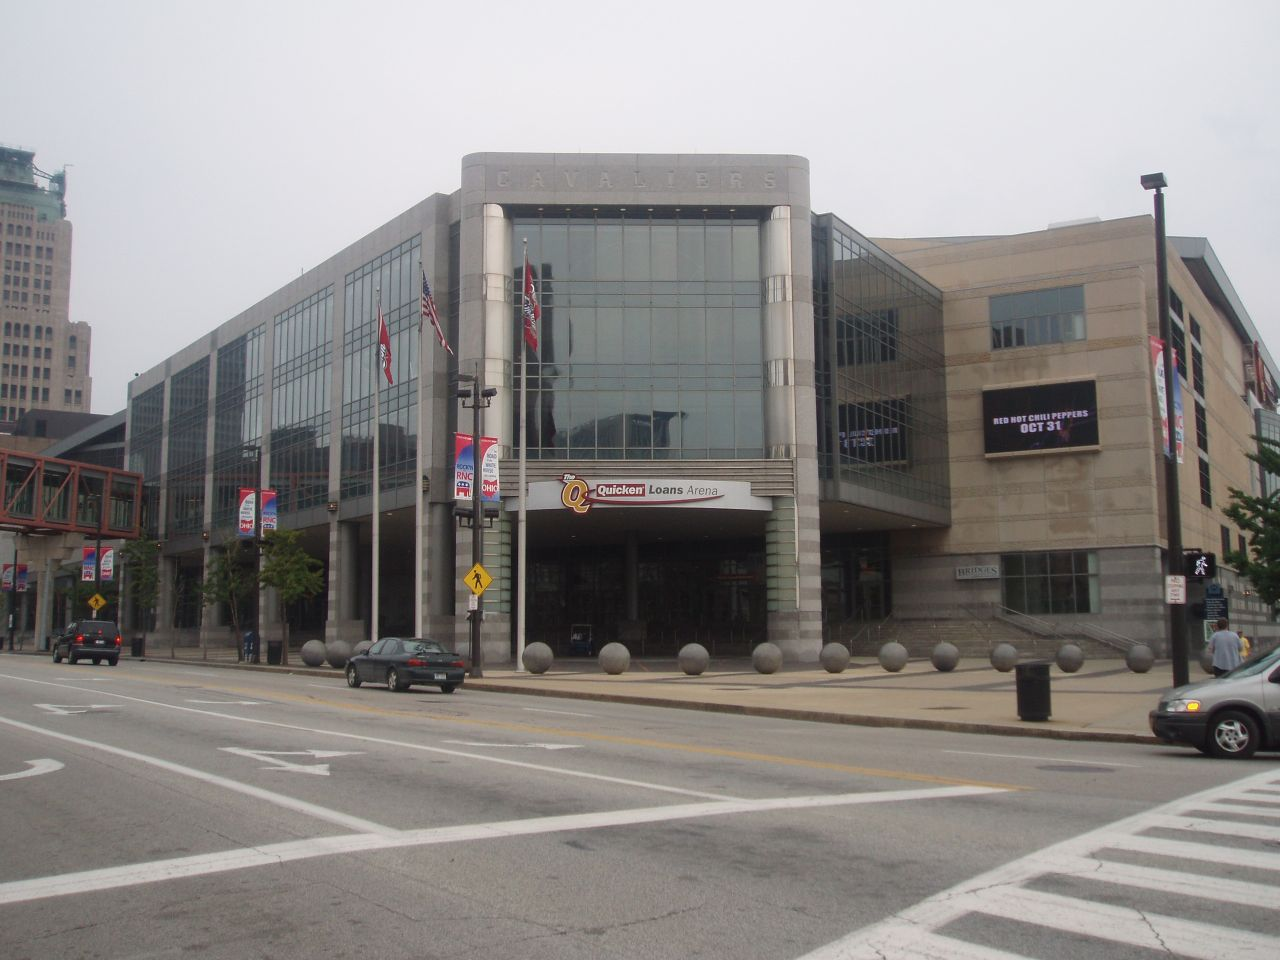 La Quicken Loans Arena, salle des Cleveland Cavaliers en NBA